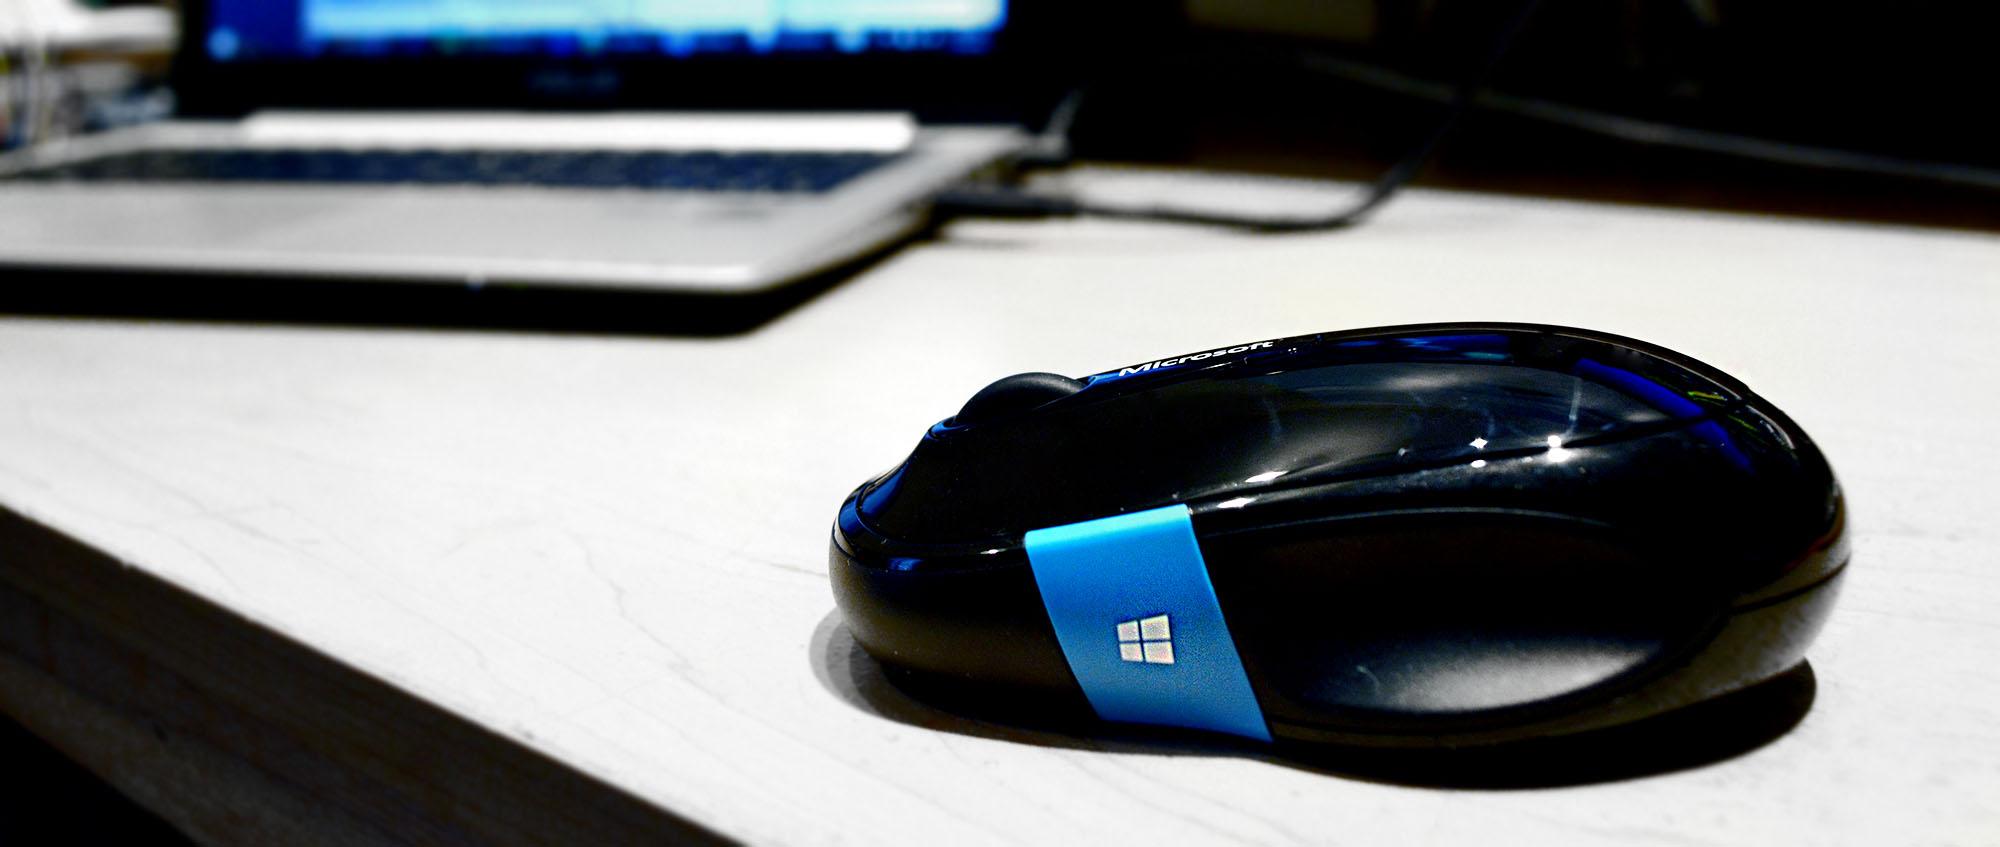 Back/Forward on Microsoft Sculpt Comfort – Steve Zazeski